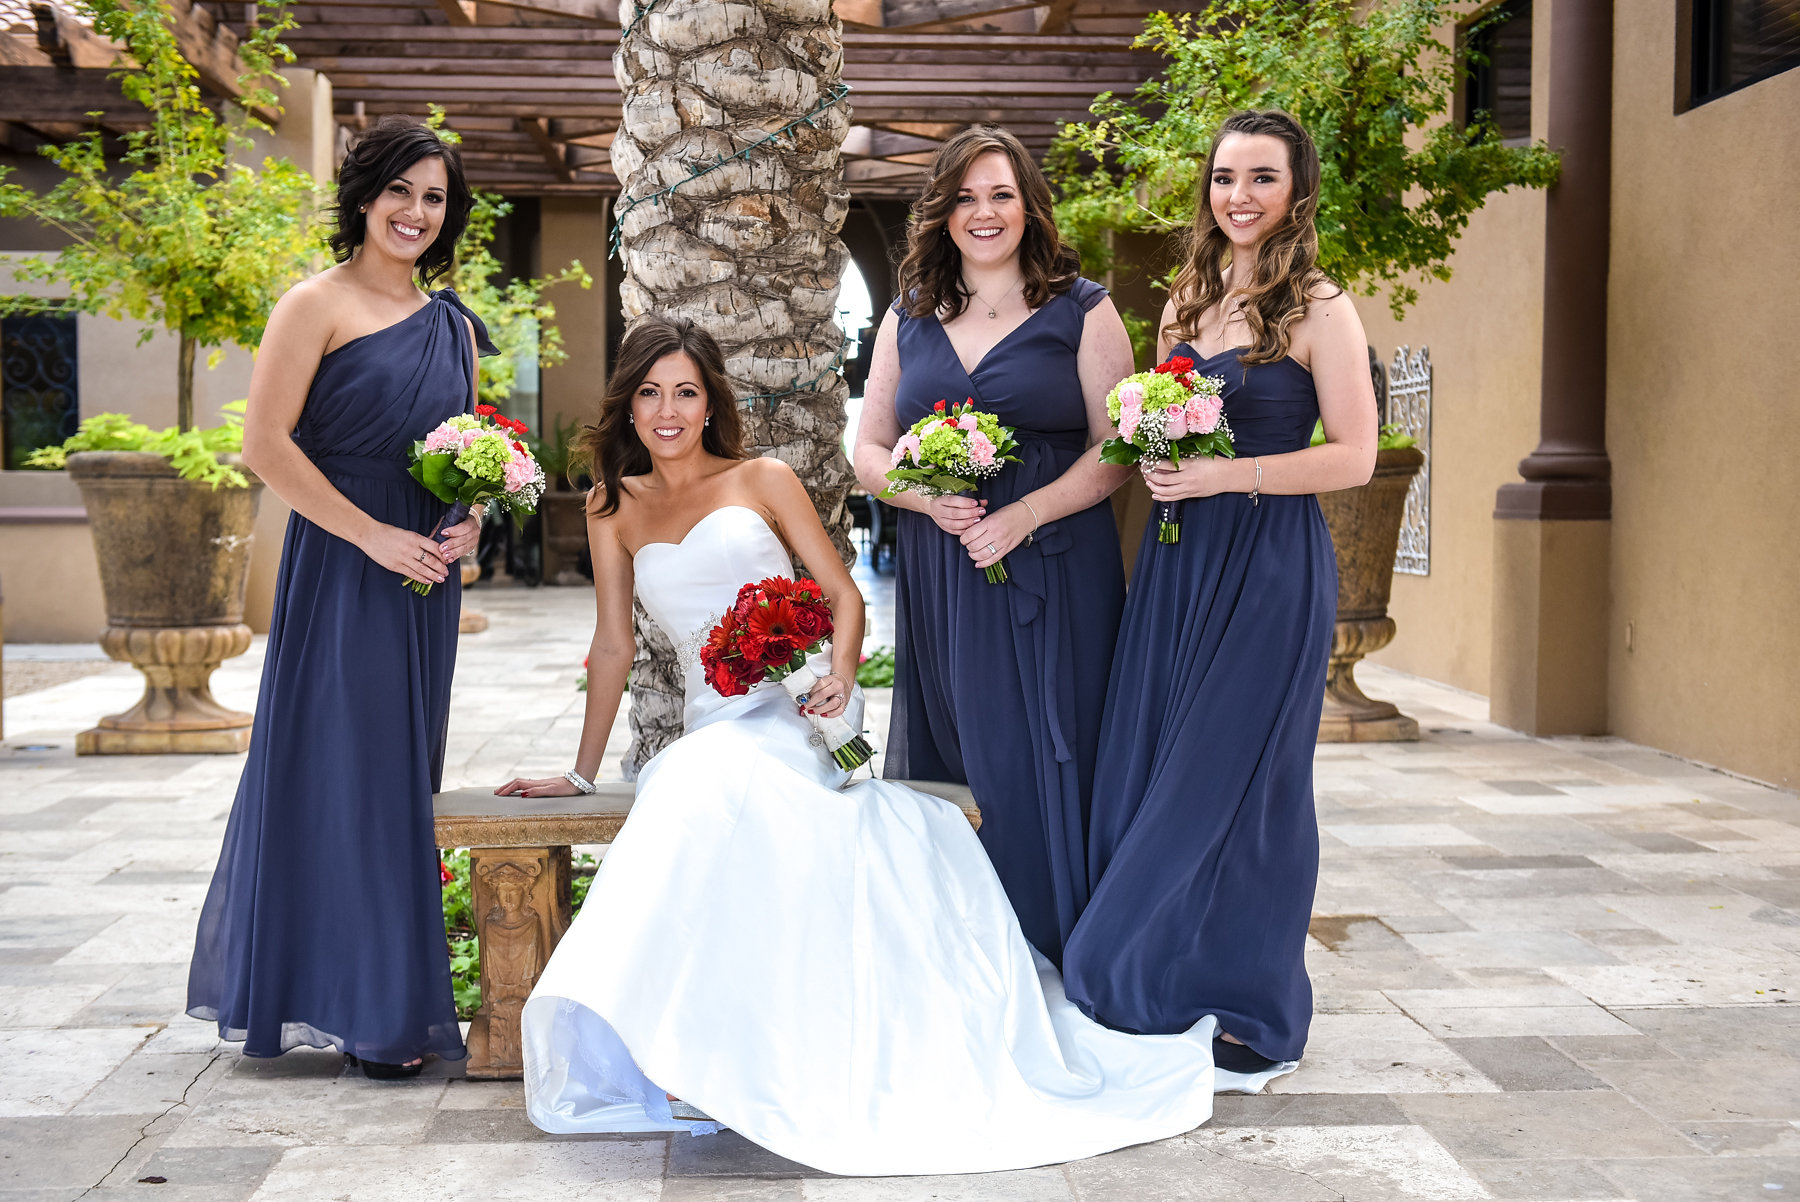 seville-wedding-photographers-phoenix--¬ther2studio-199